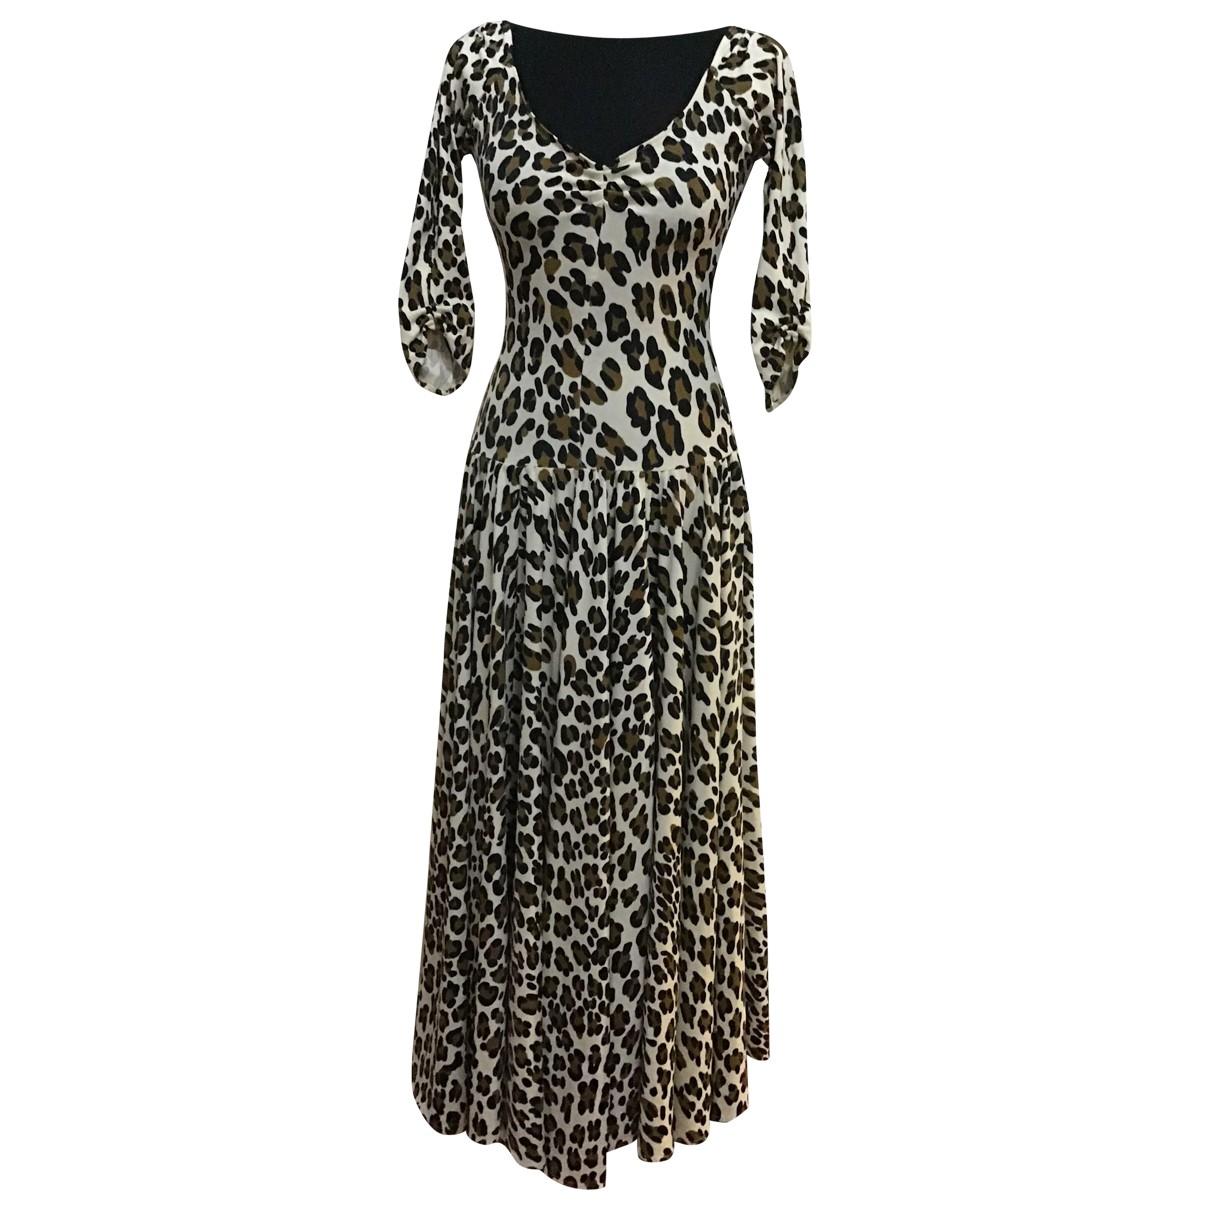 Norma Kamali \N dress for Women M International